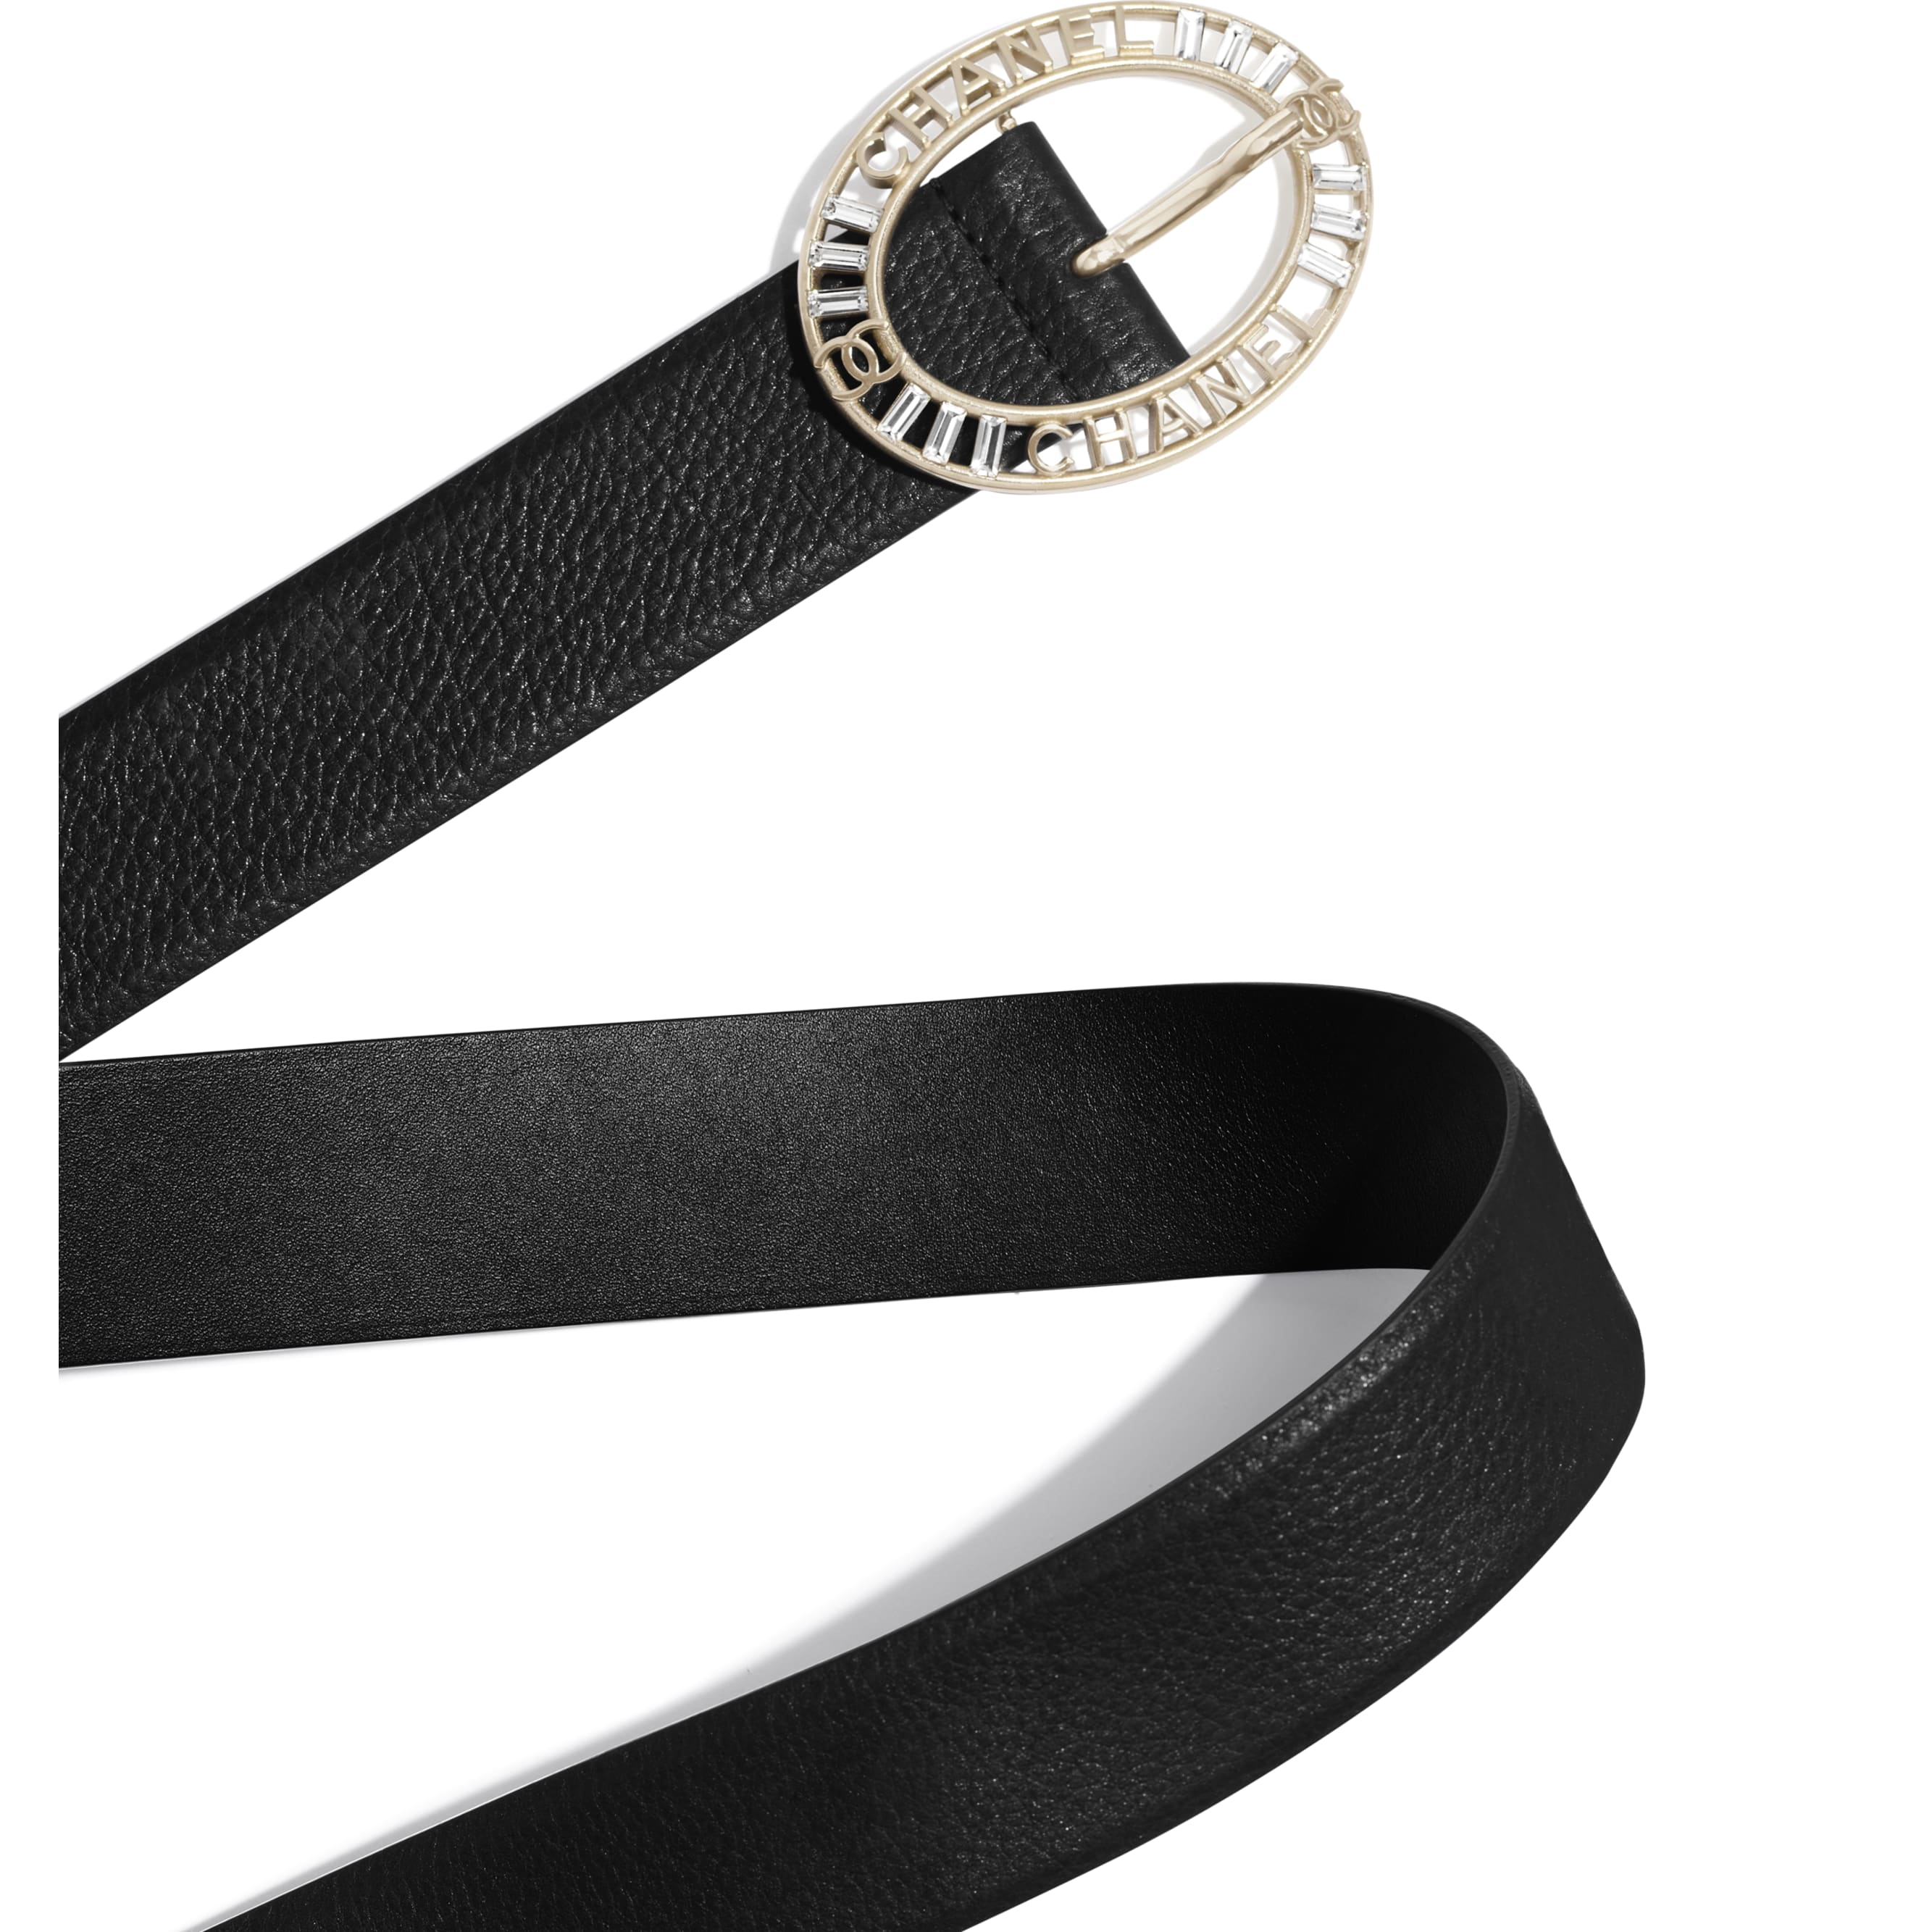 Belt - Black - Calfskin, Gold-Tone Metal & Diamanté - Alternative view - see standard sized version